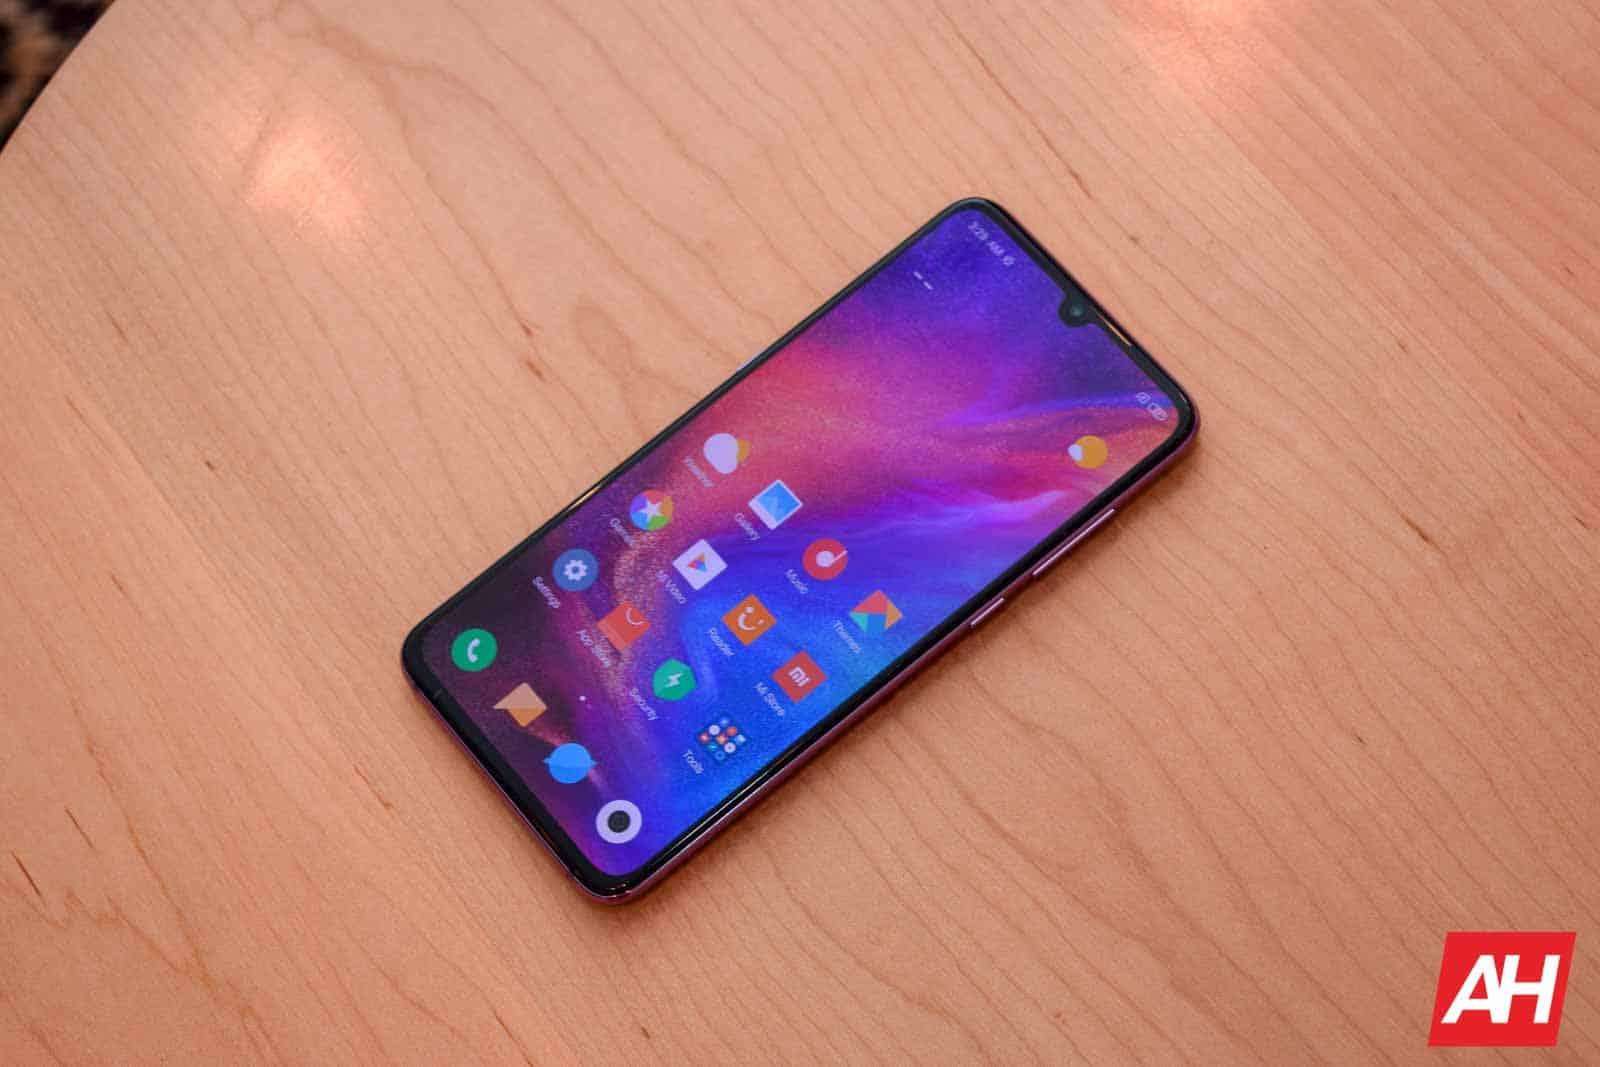 Xiaomi Mi 9 Hands On AM AH 4